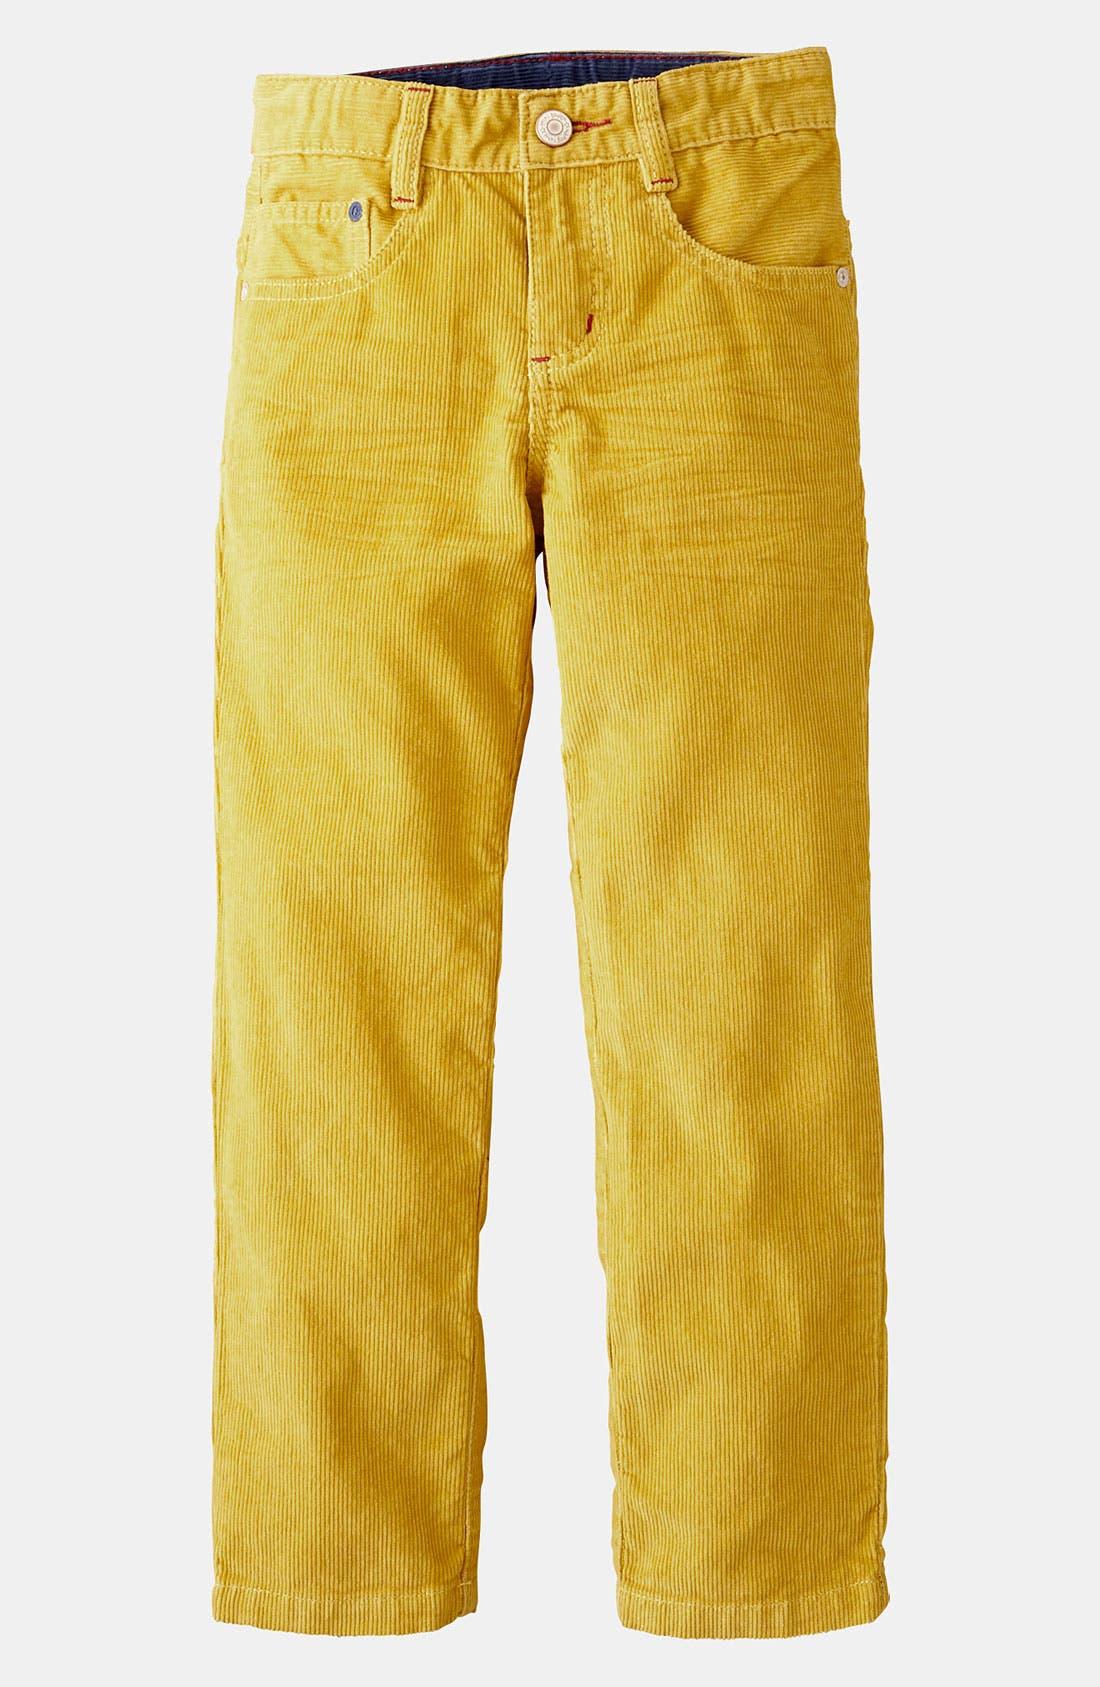 Alternate Image 1 Selected - Mini Boden 'Preppy' Slim Corduroy Pants (Little Boys & Big Boys)